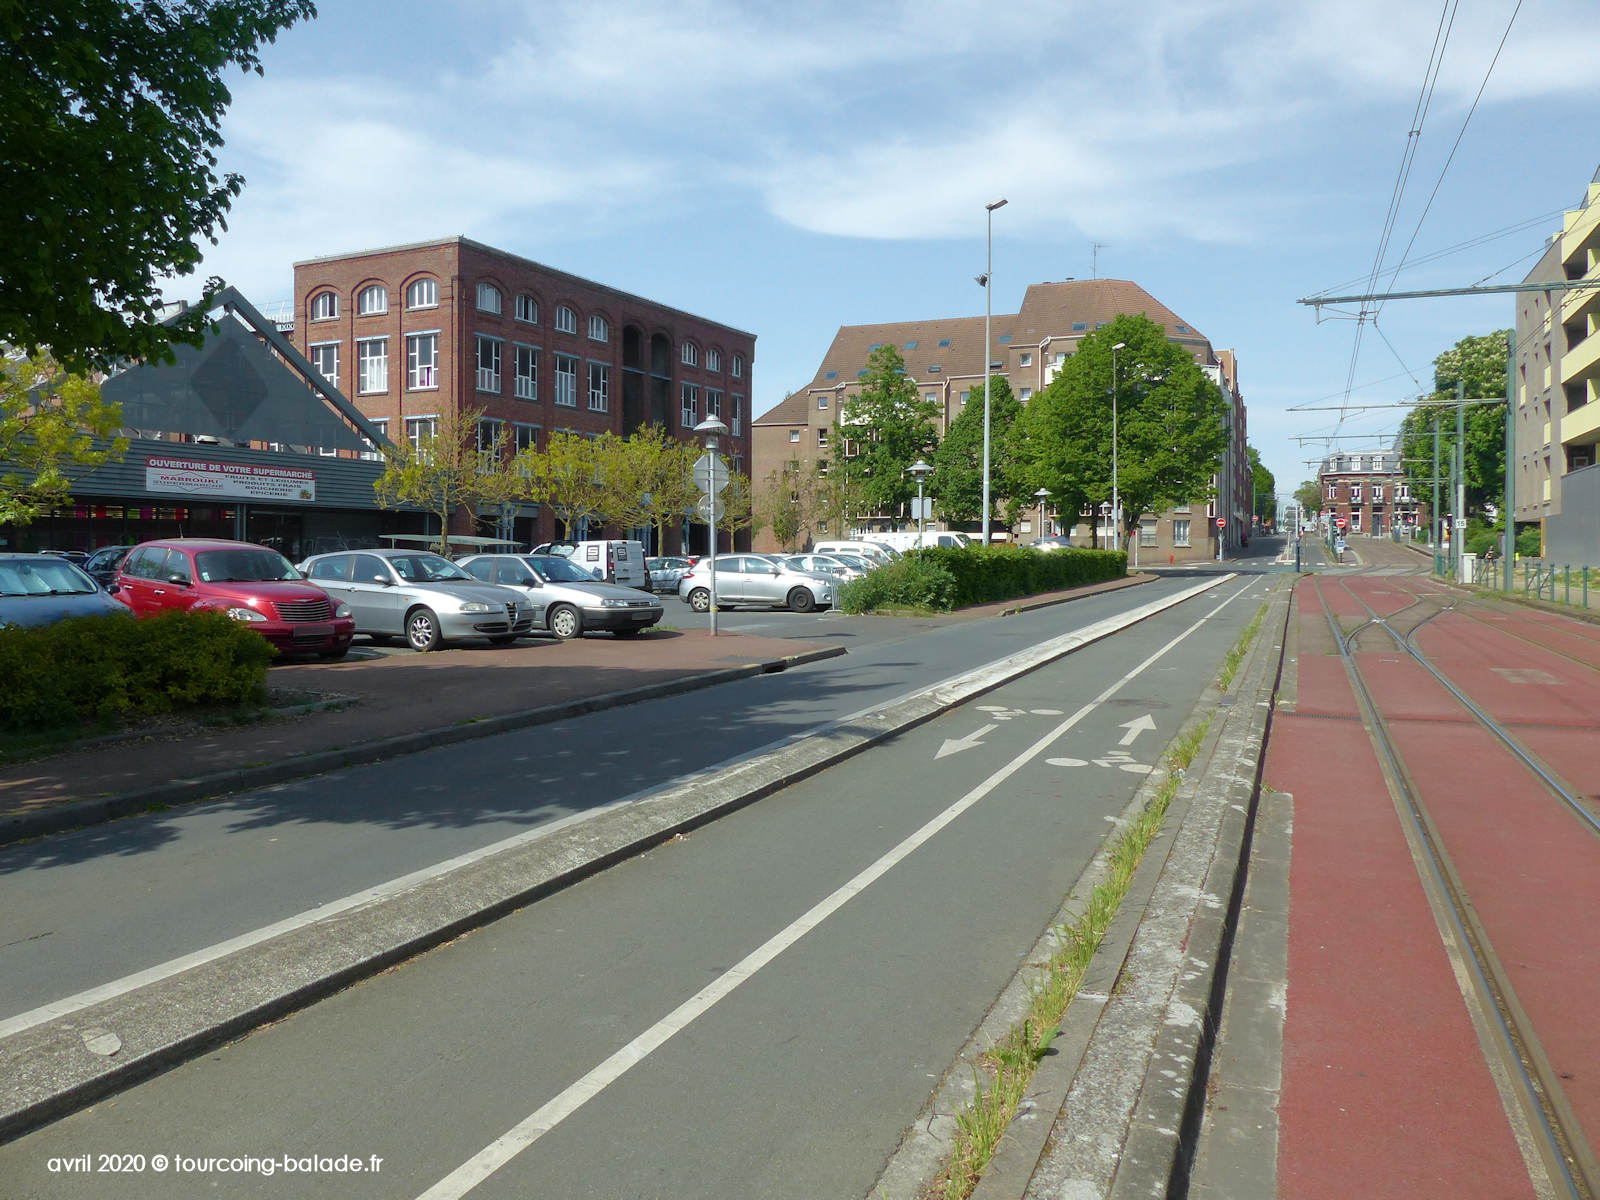 Avenue Pompidou, Mabrouki supermarché, Tourcoing 2020